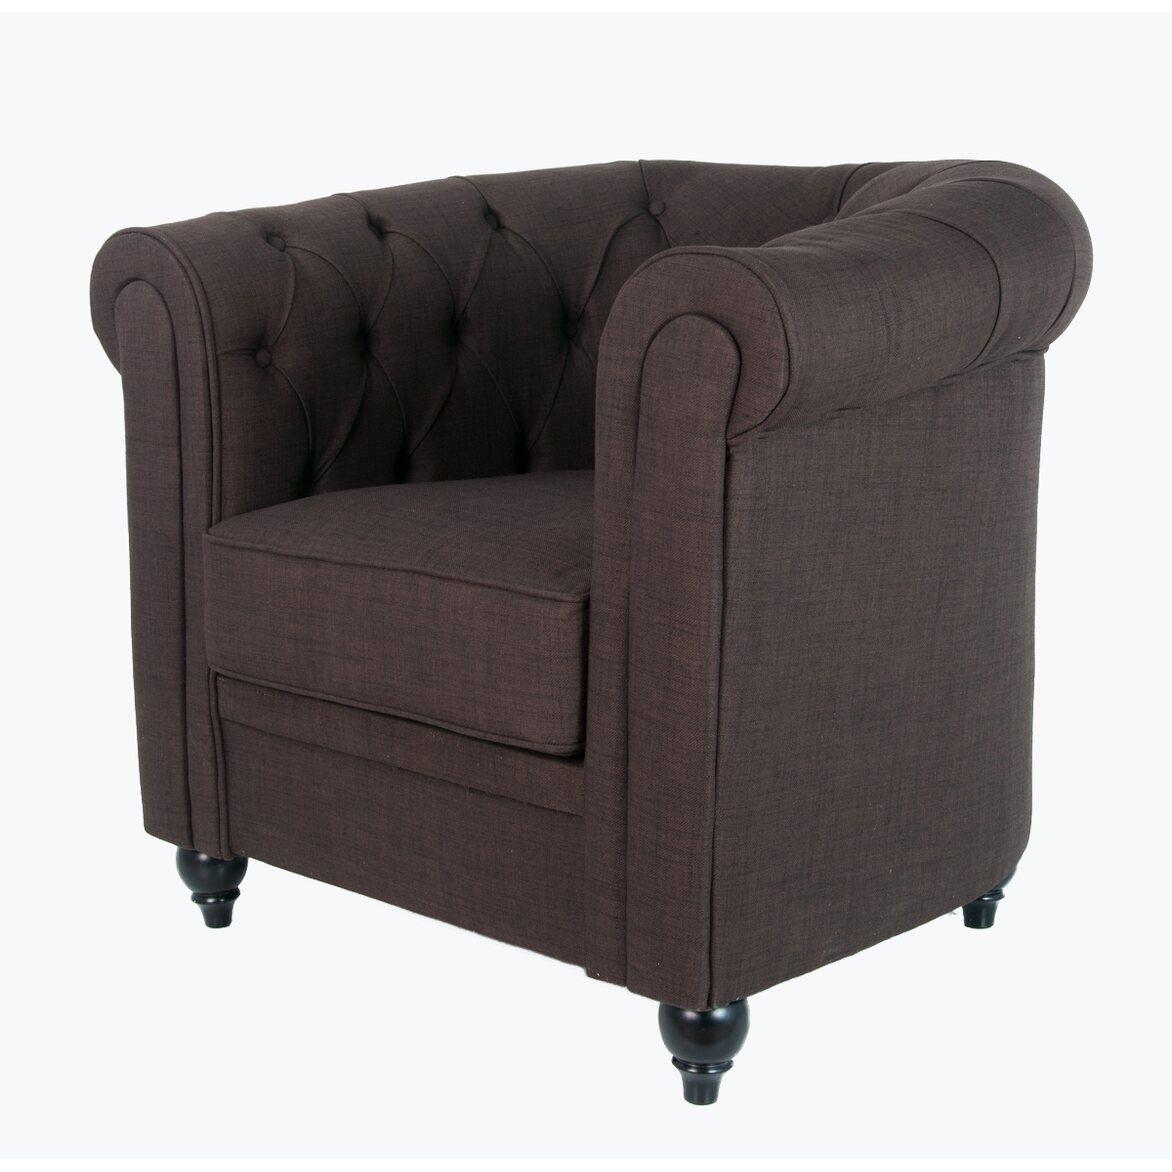 Кресло Nala brown 3 | Каминные кресла Kingsby